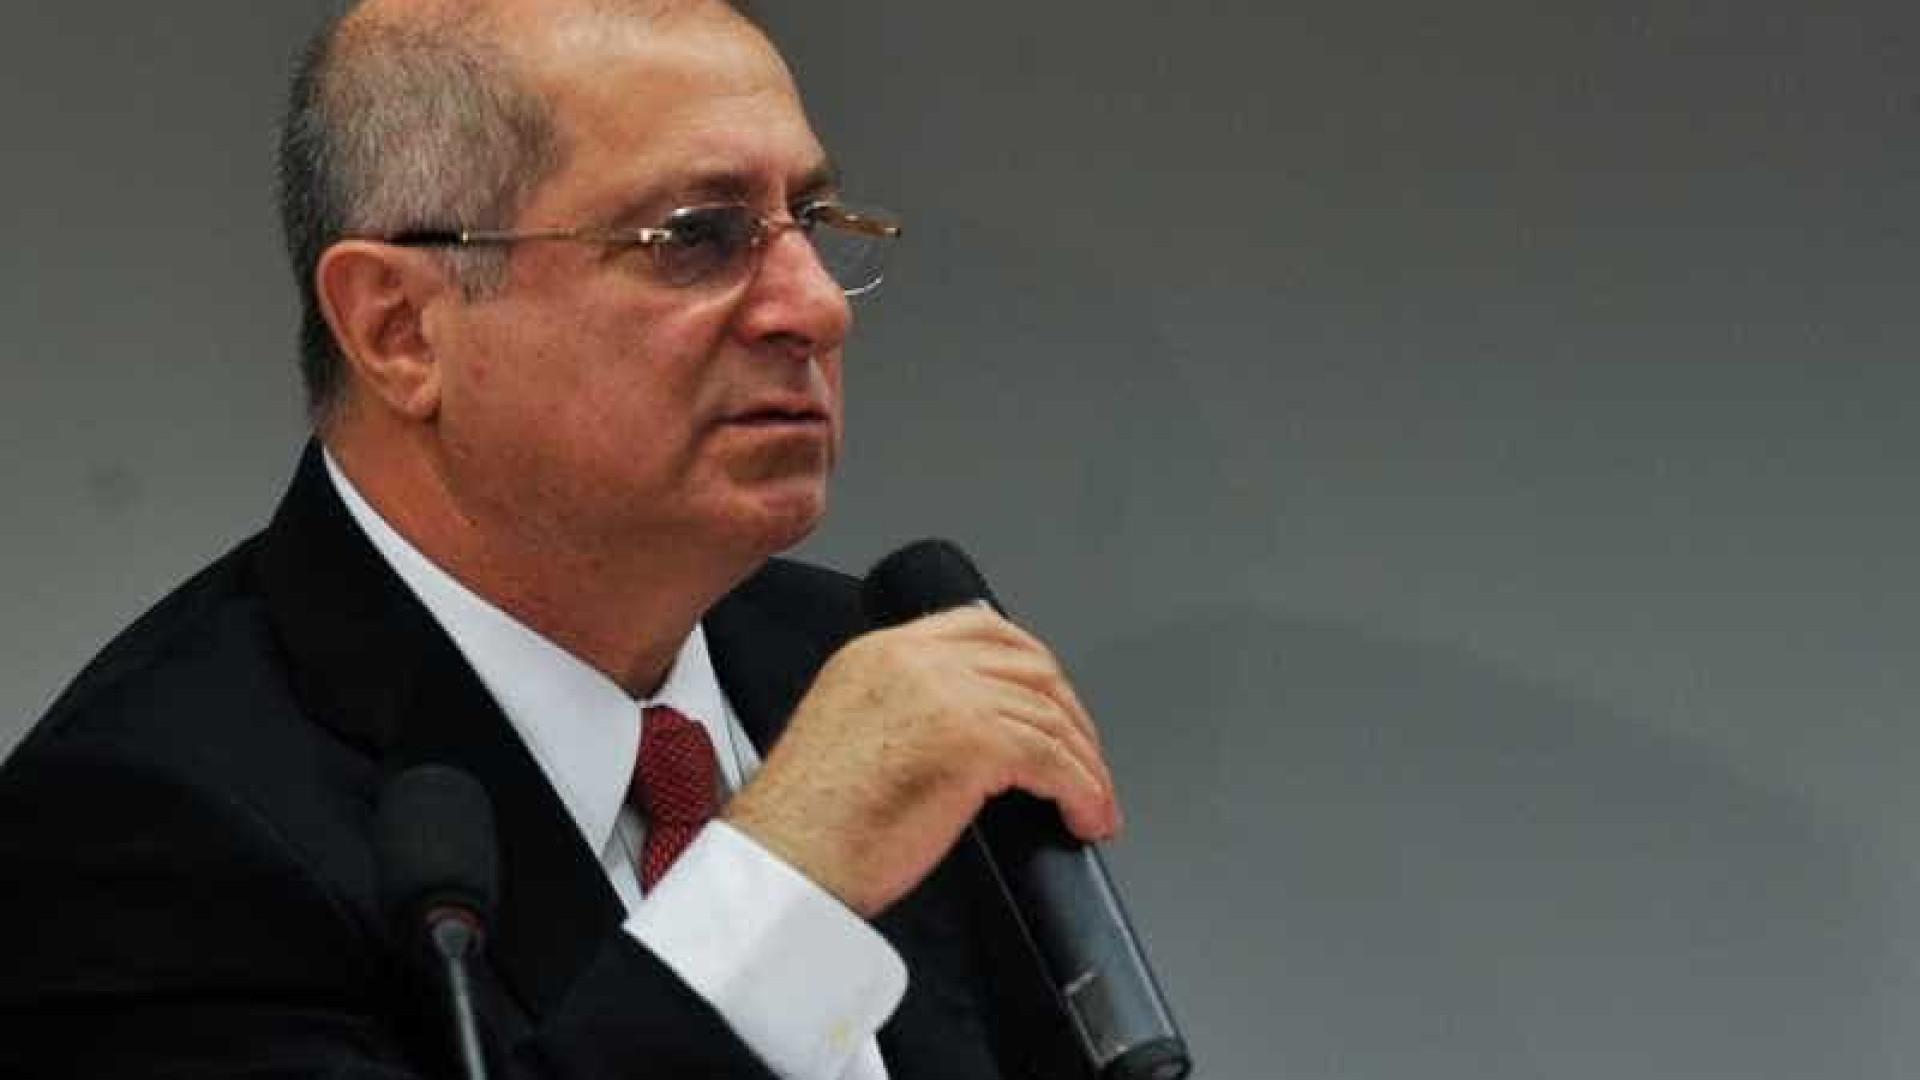 Ex-ministro Paulo Bernardo é preso  na Operação Lava Jato